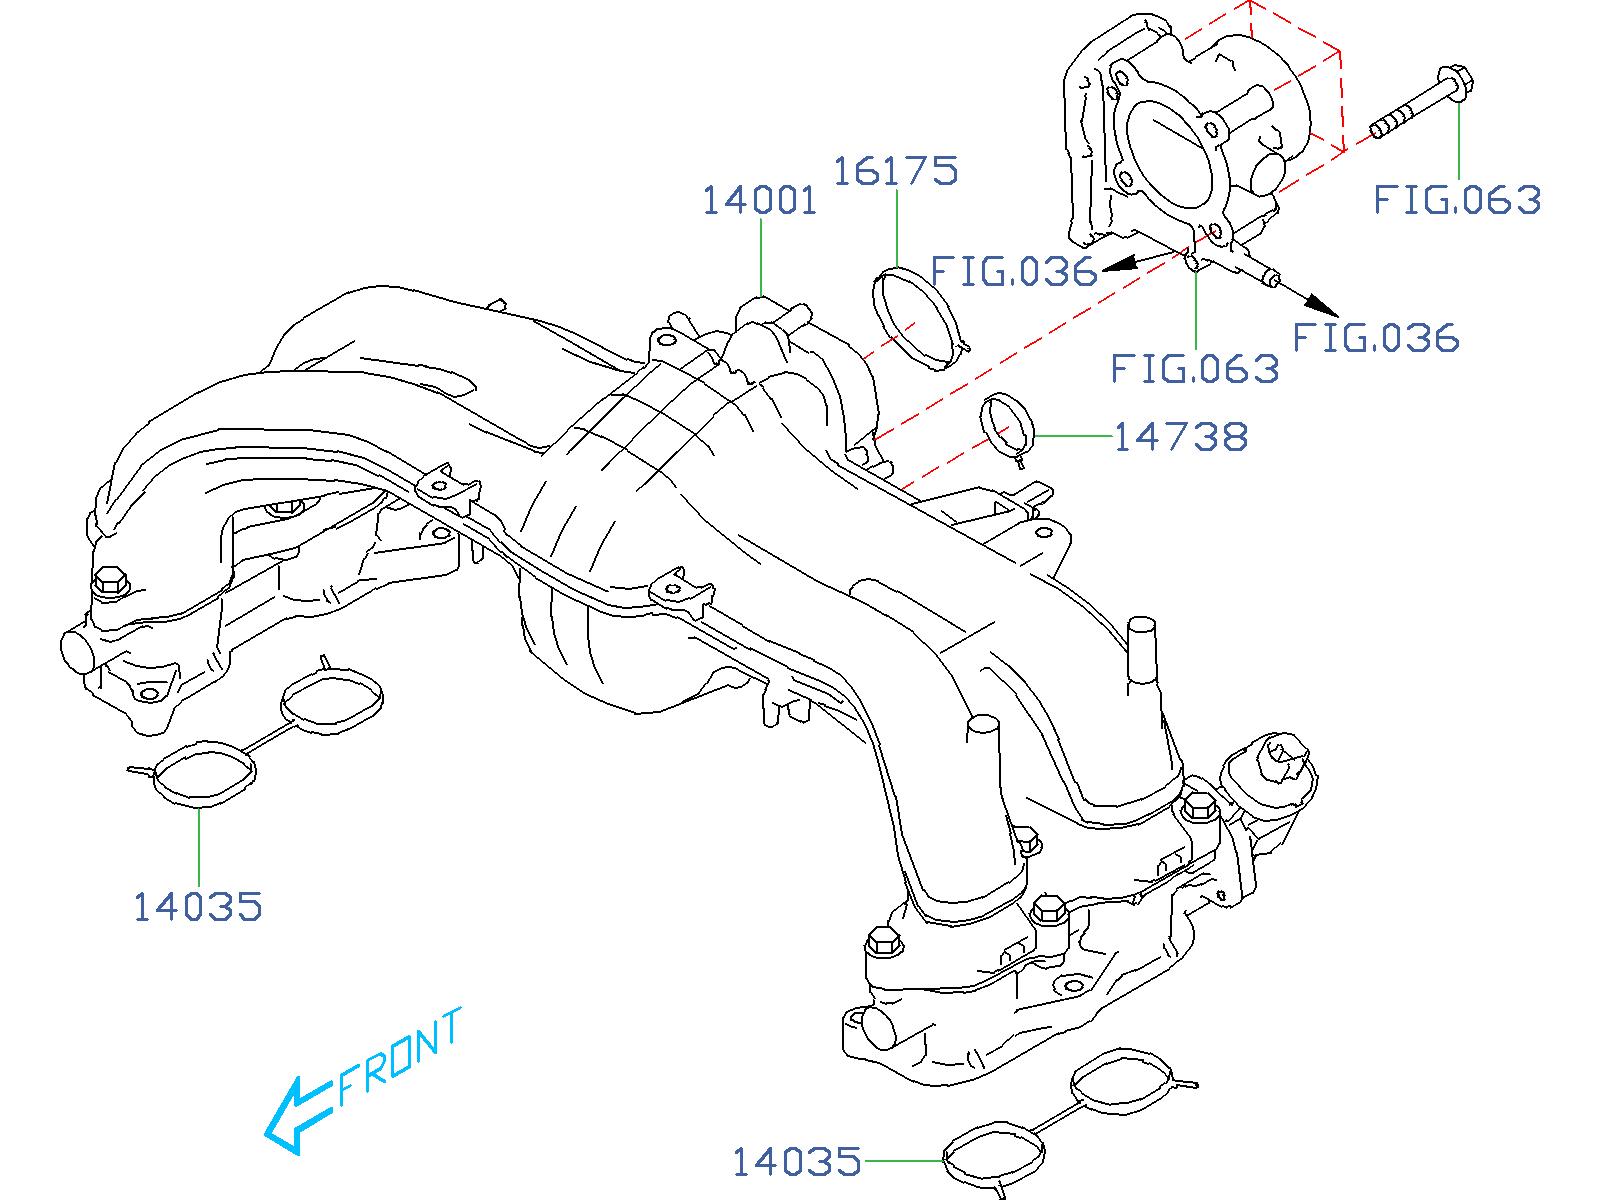 Subaru Forester Engine Intake Manifold Gasket